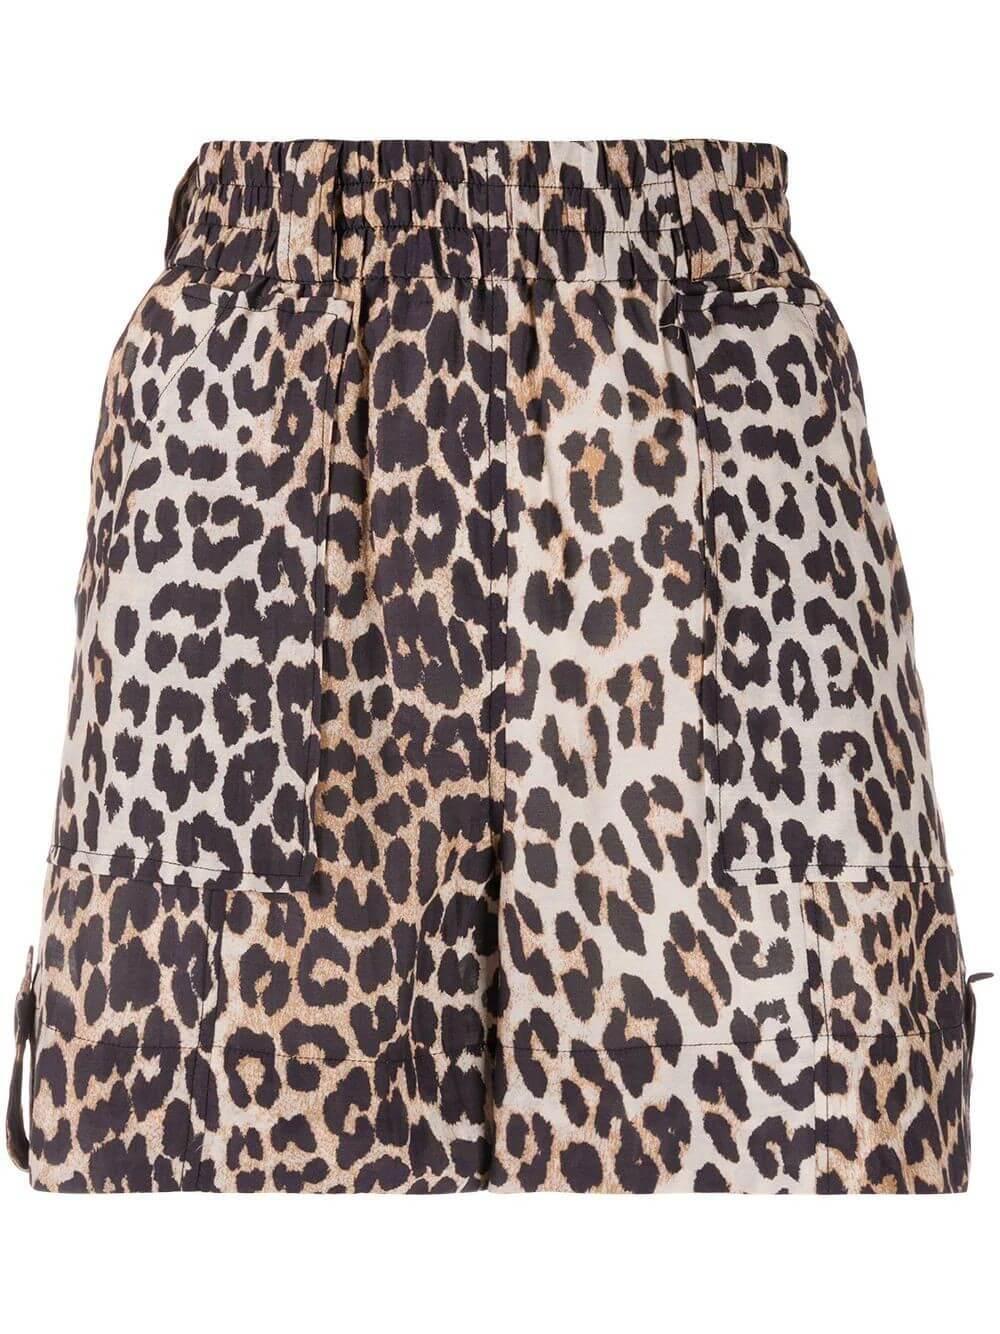 Leopard Cotton Silk Short Item # F4942